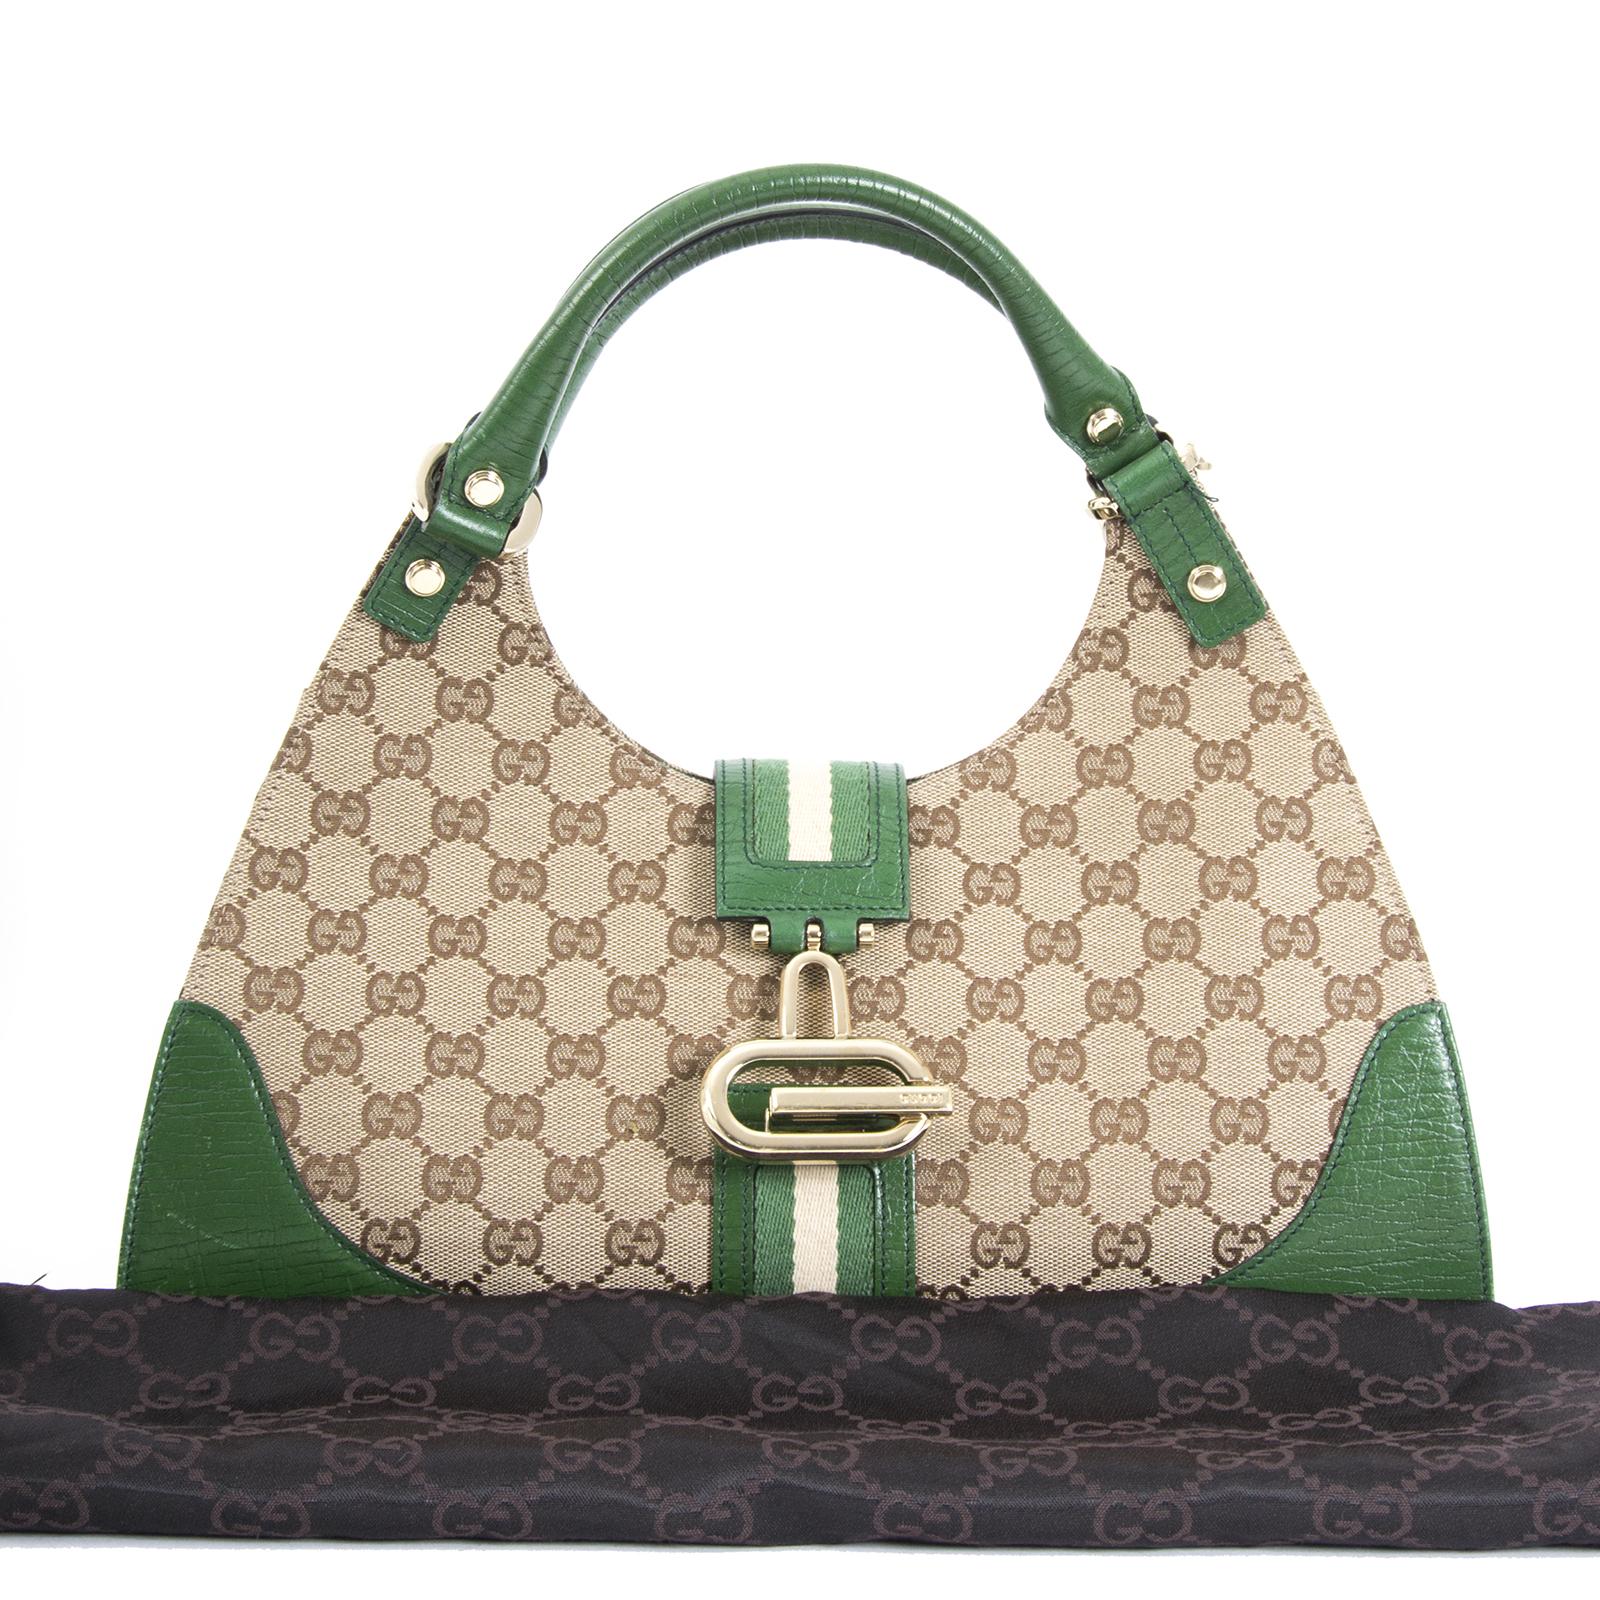 Gucci Monogram Green Top Handle Bag